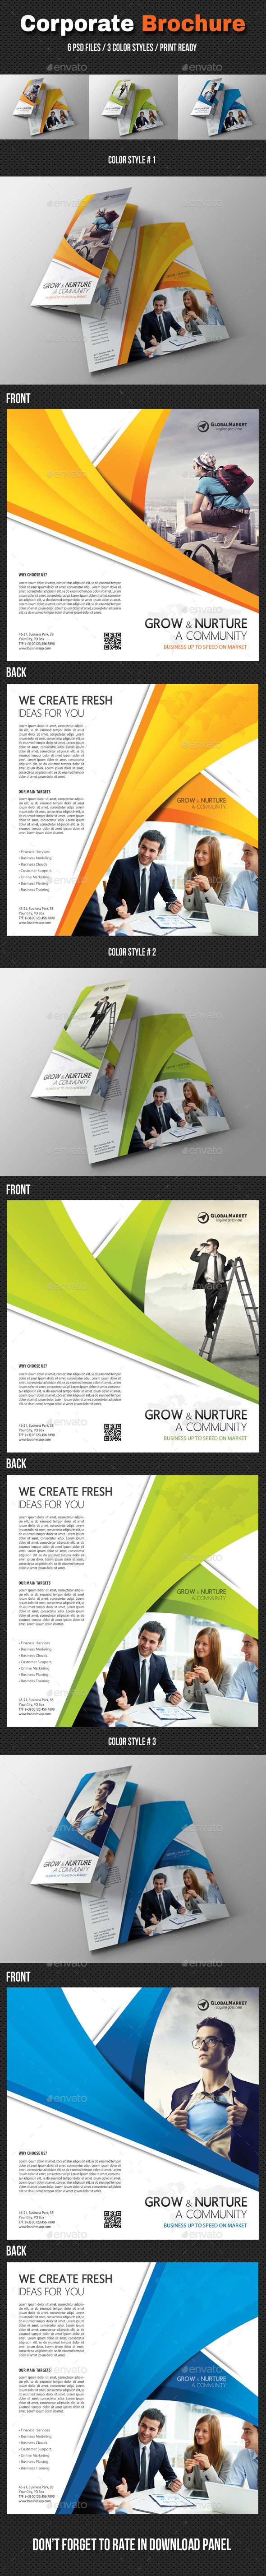 Corporate Bifold Brochure 03